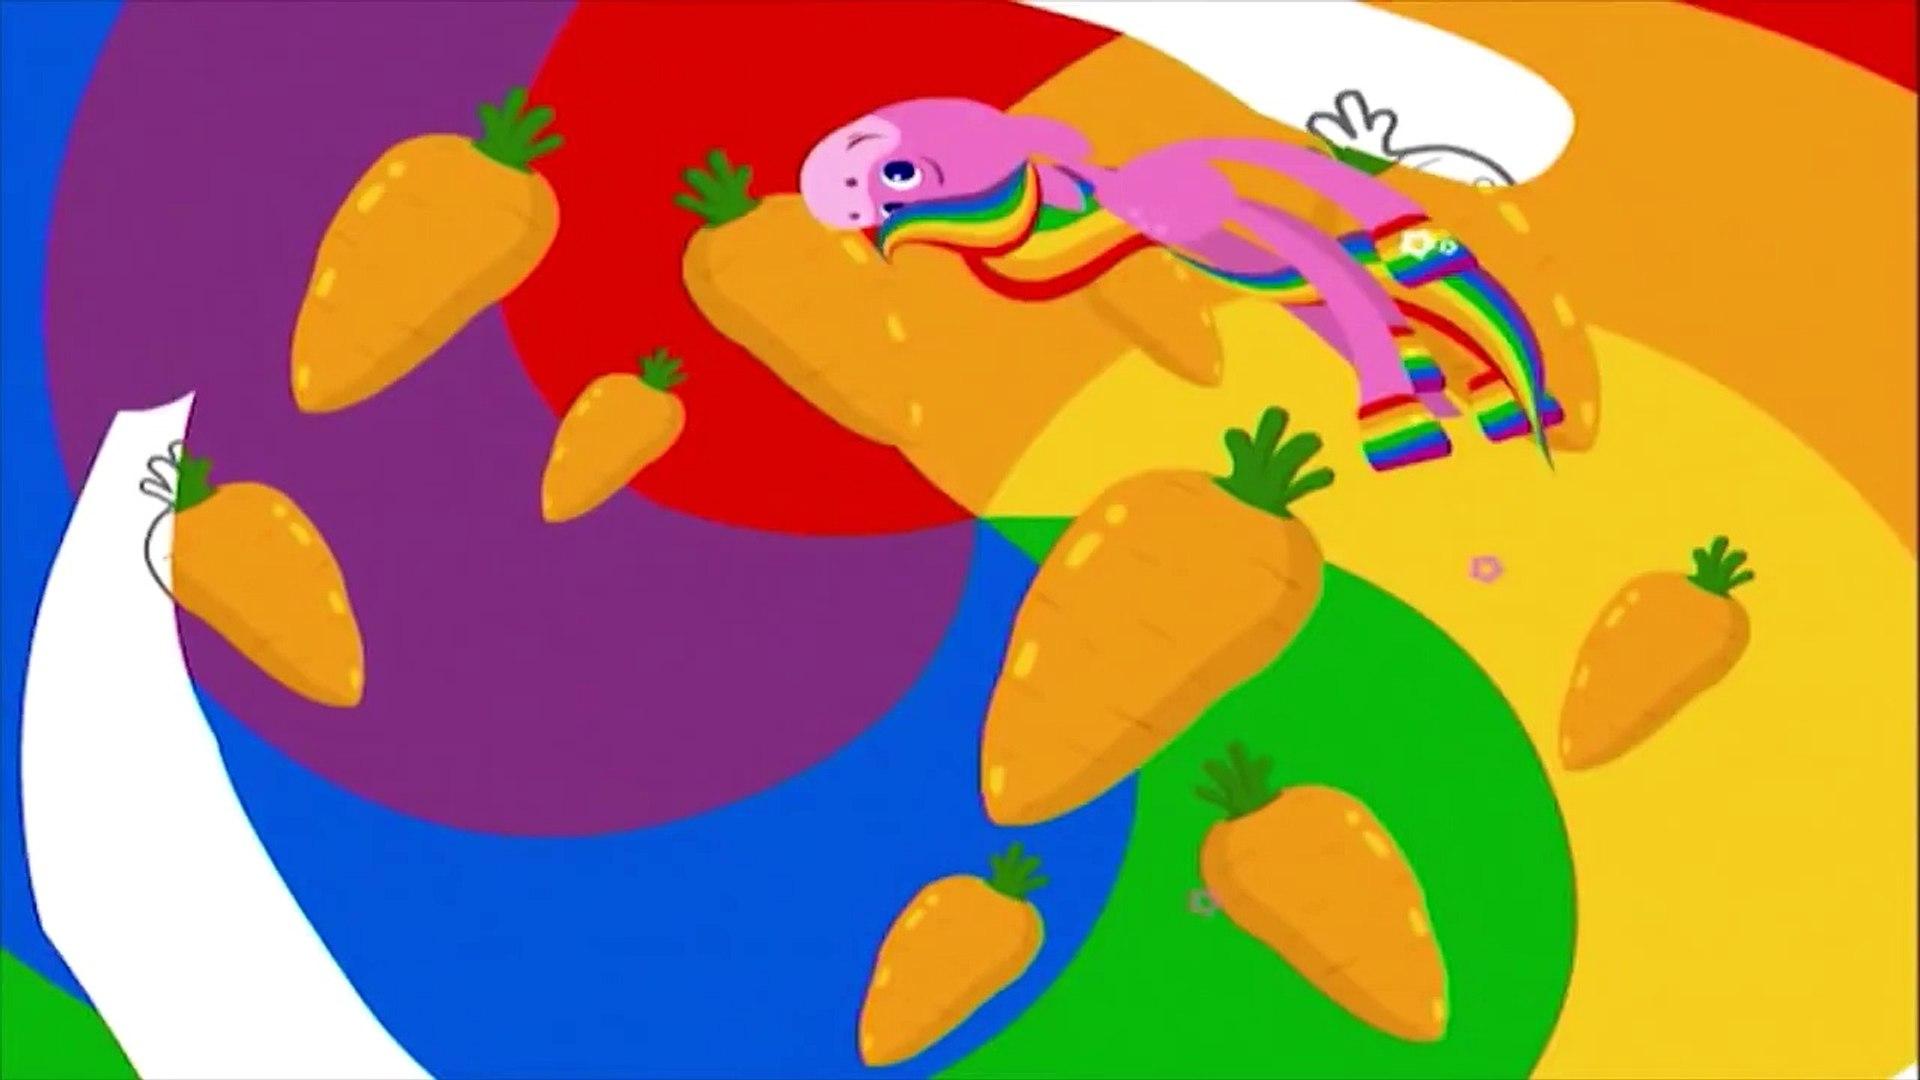 Мультфильмы для малышей BabyFirstTV - ЛОШАДКА РАДУГА, цвета для малышей - учим цвета и овощи